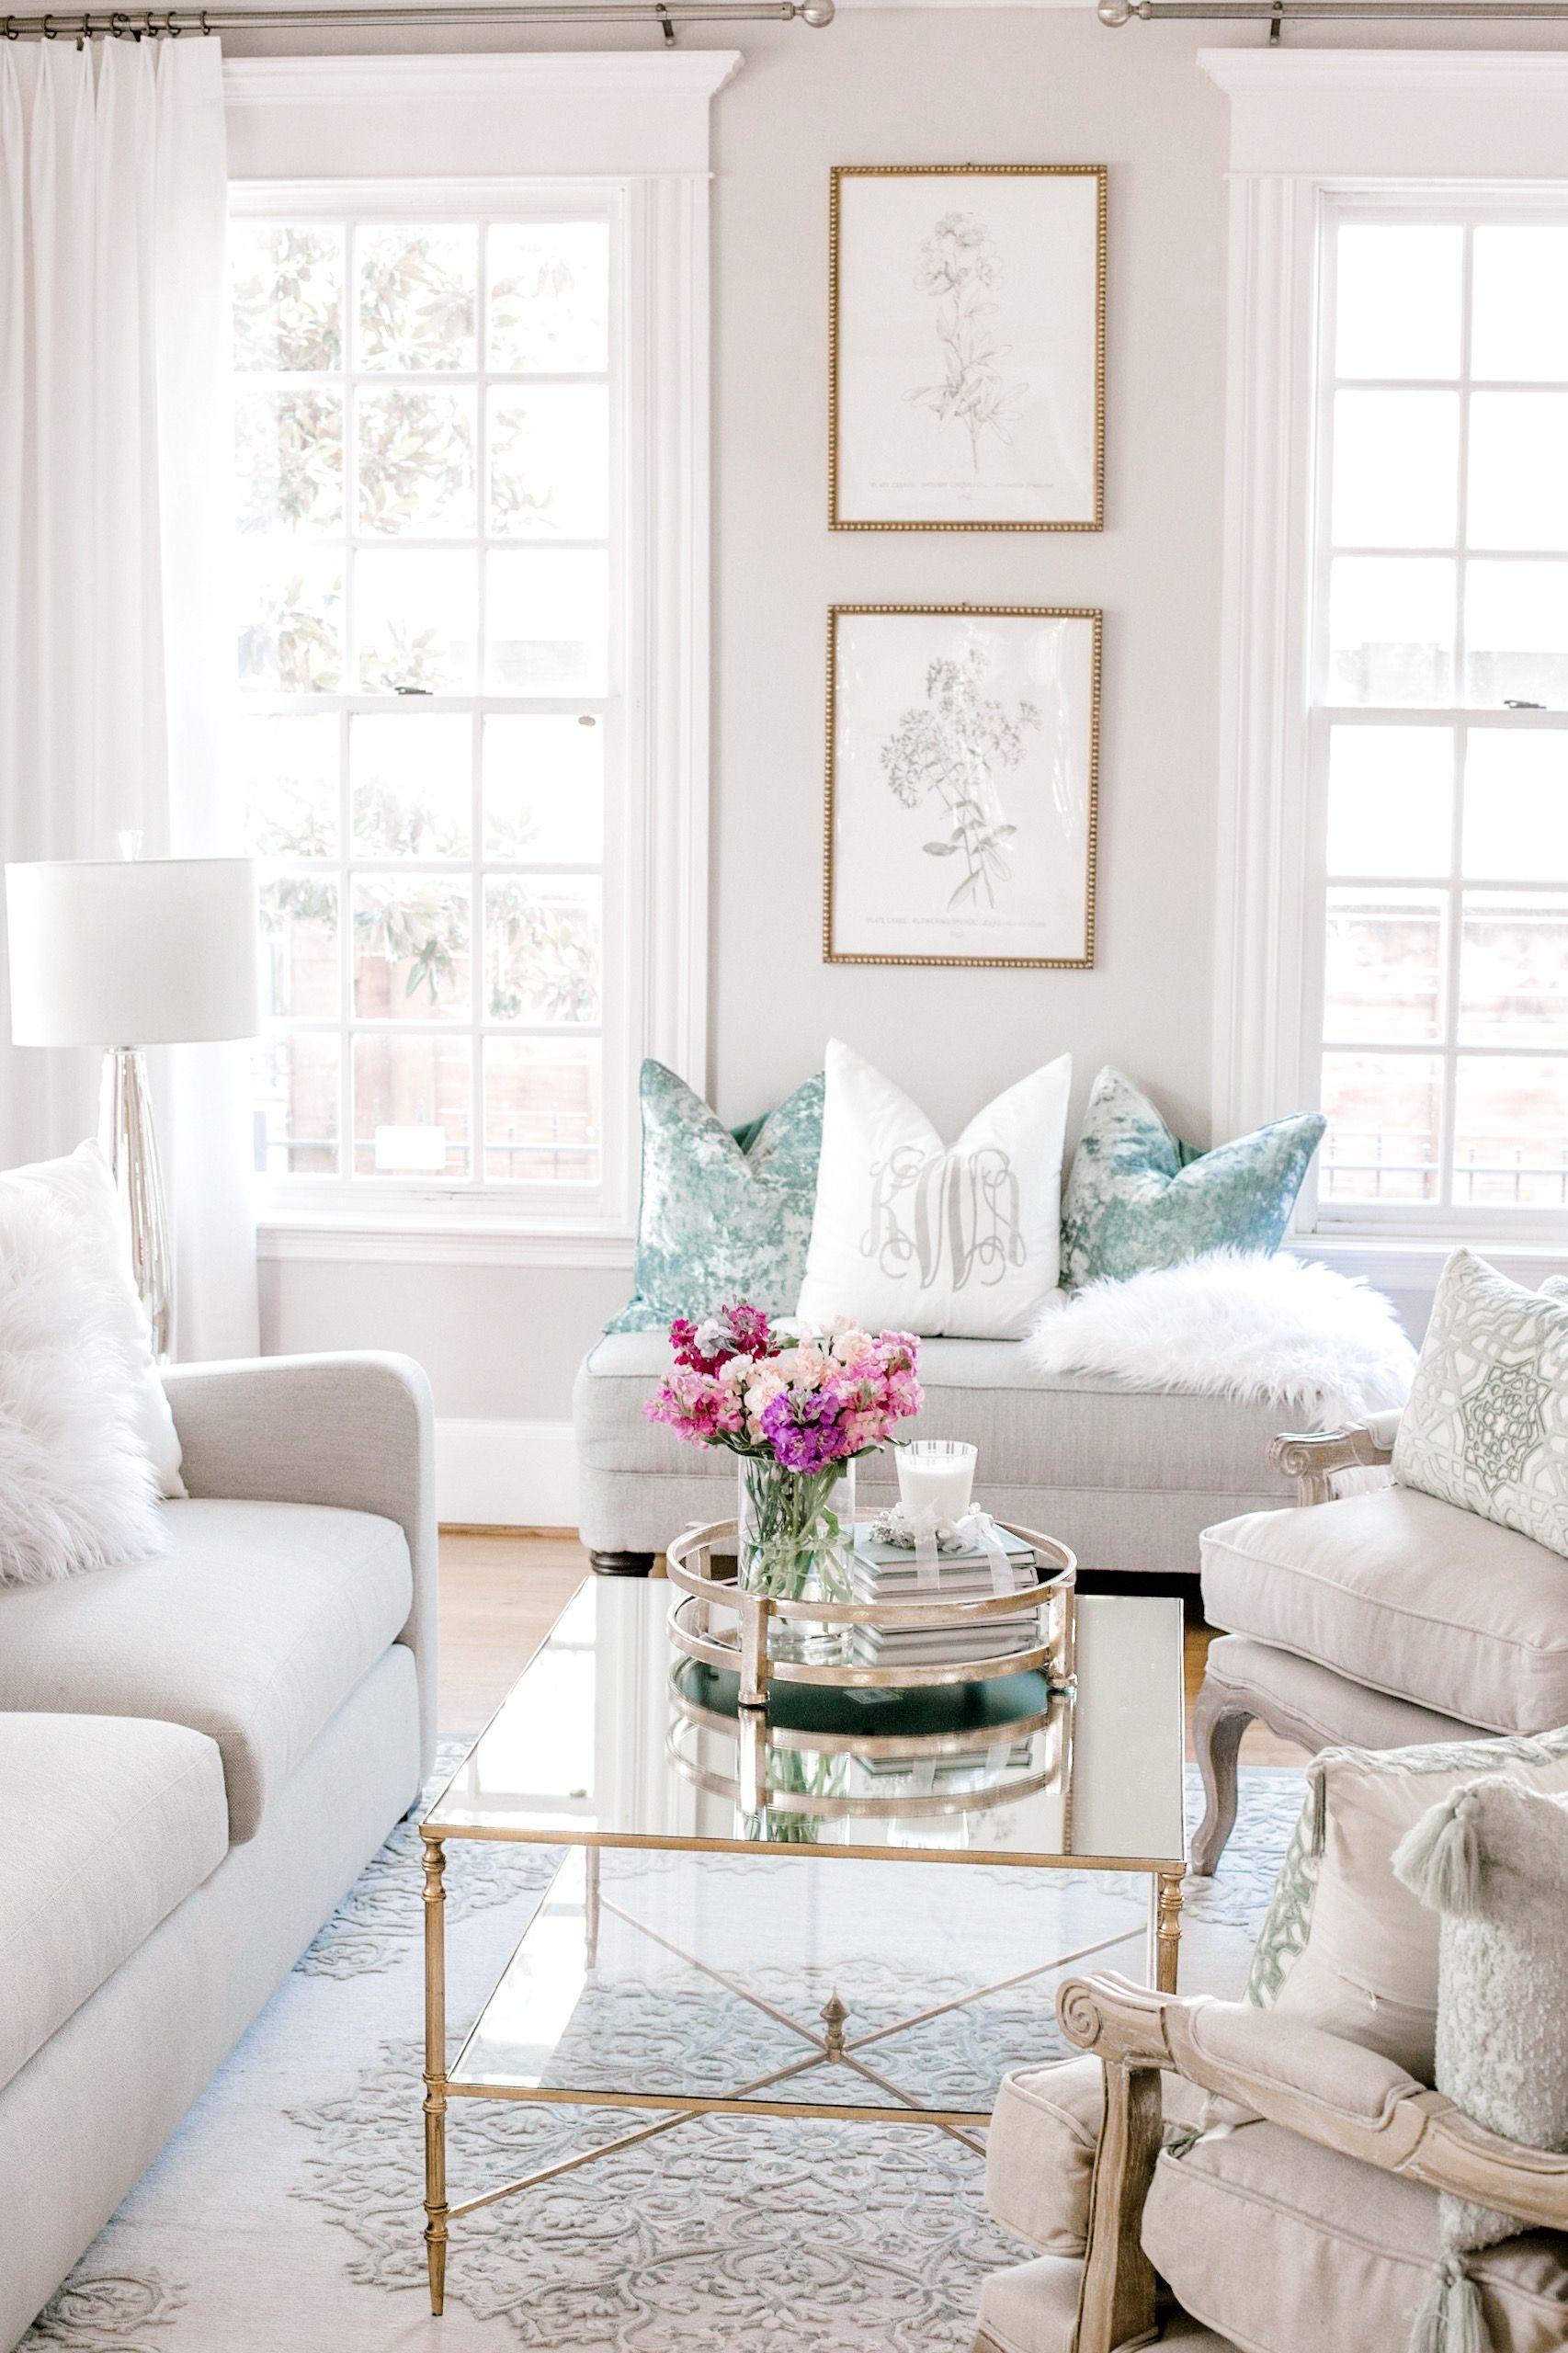 Instagram Roundup June 2019 Formal living rooms, Glam